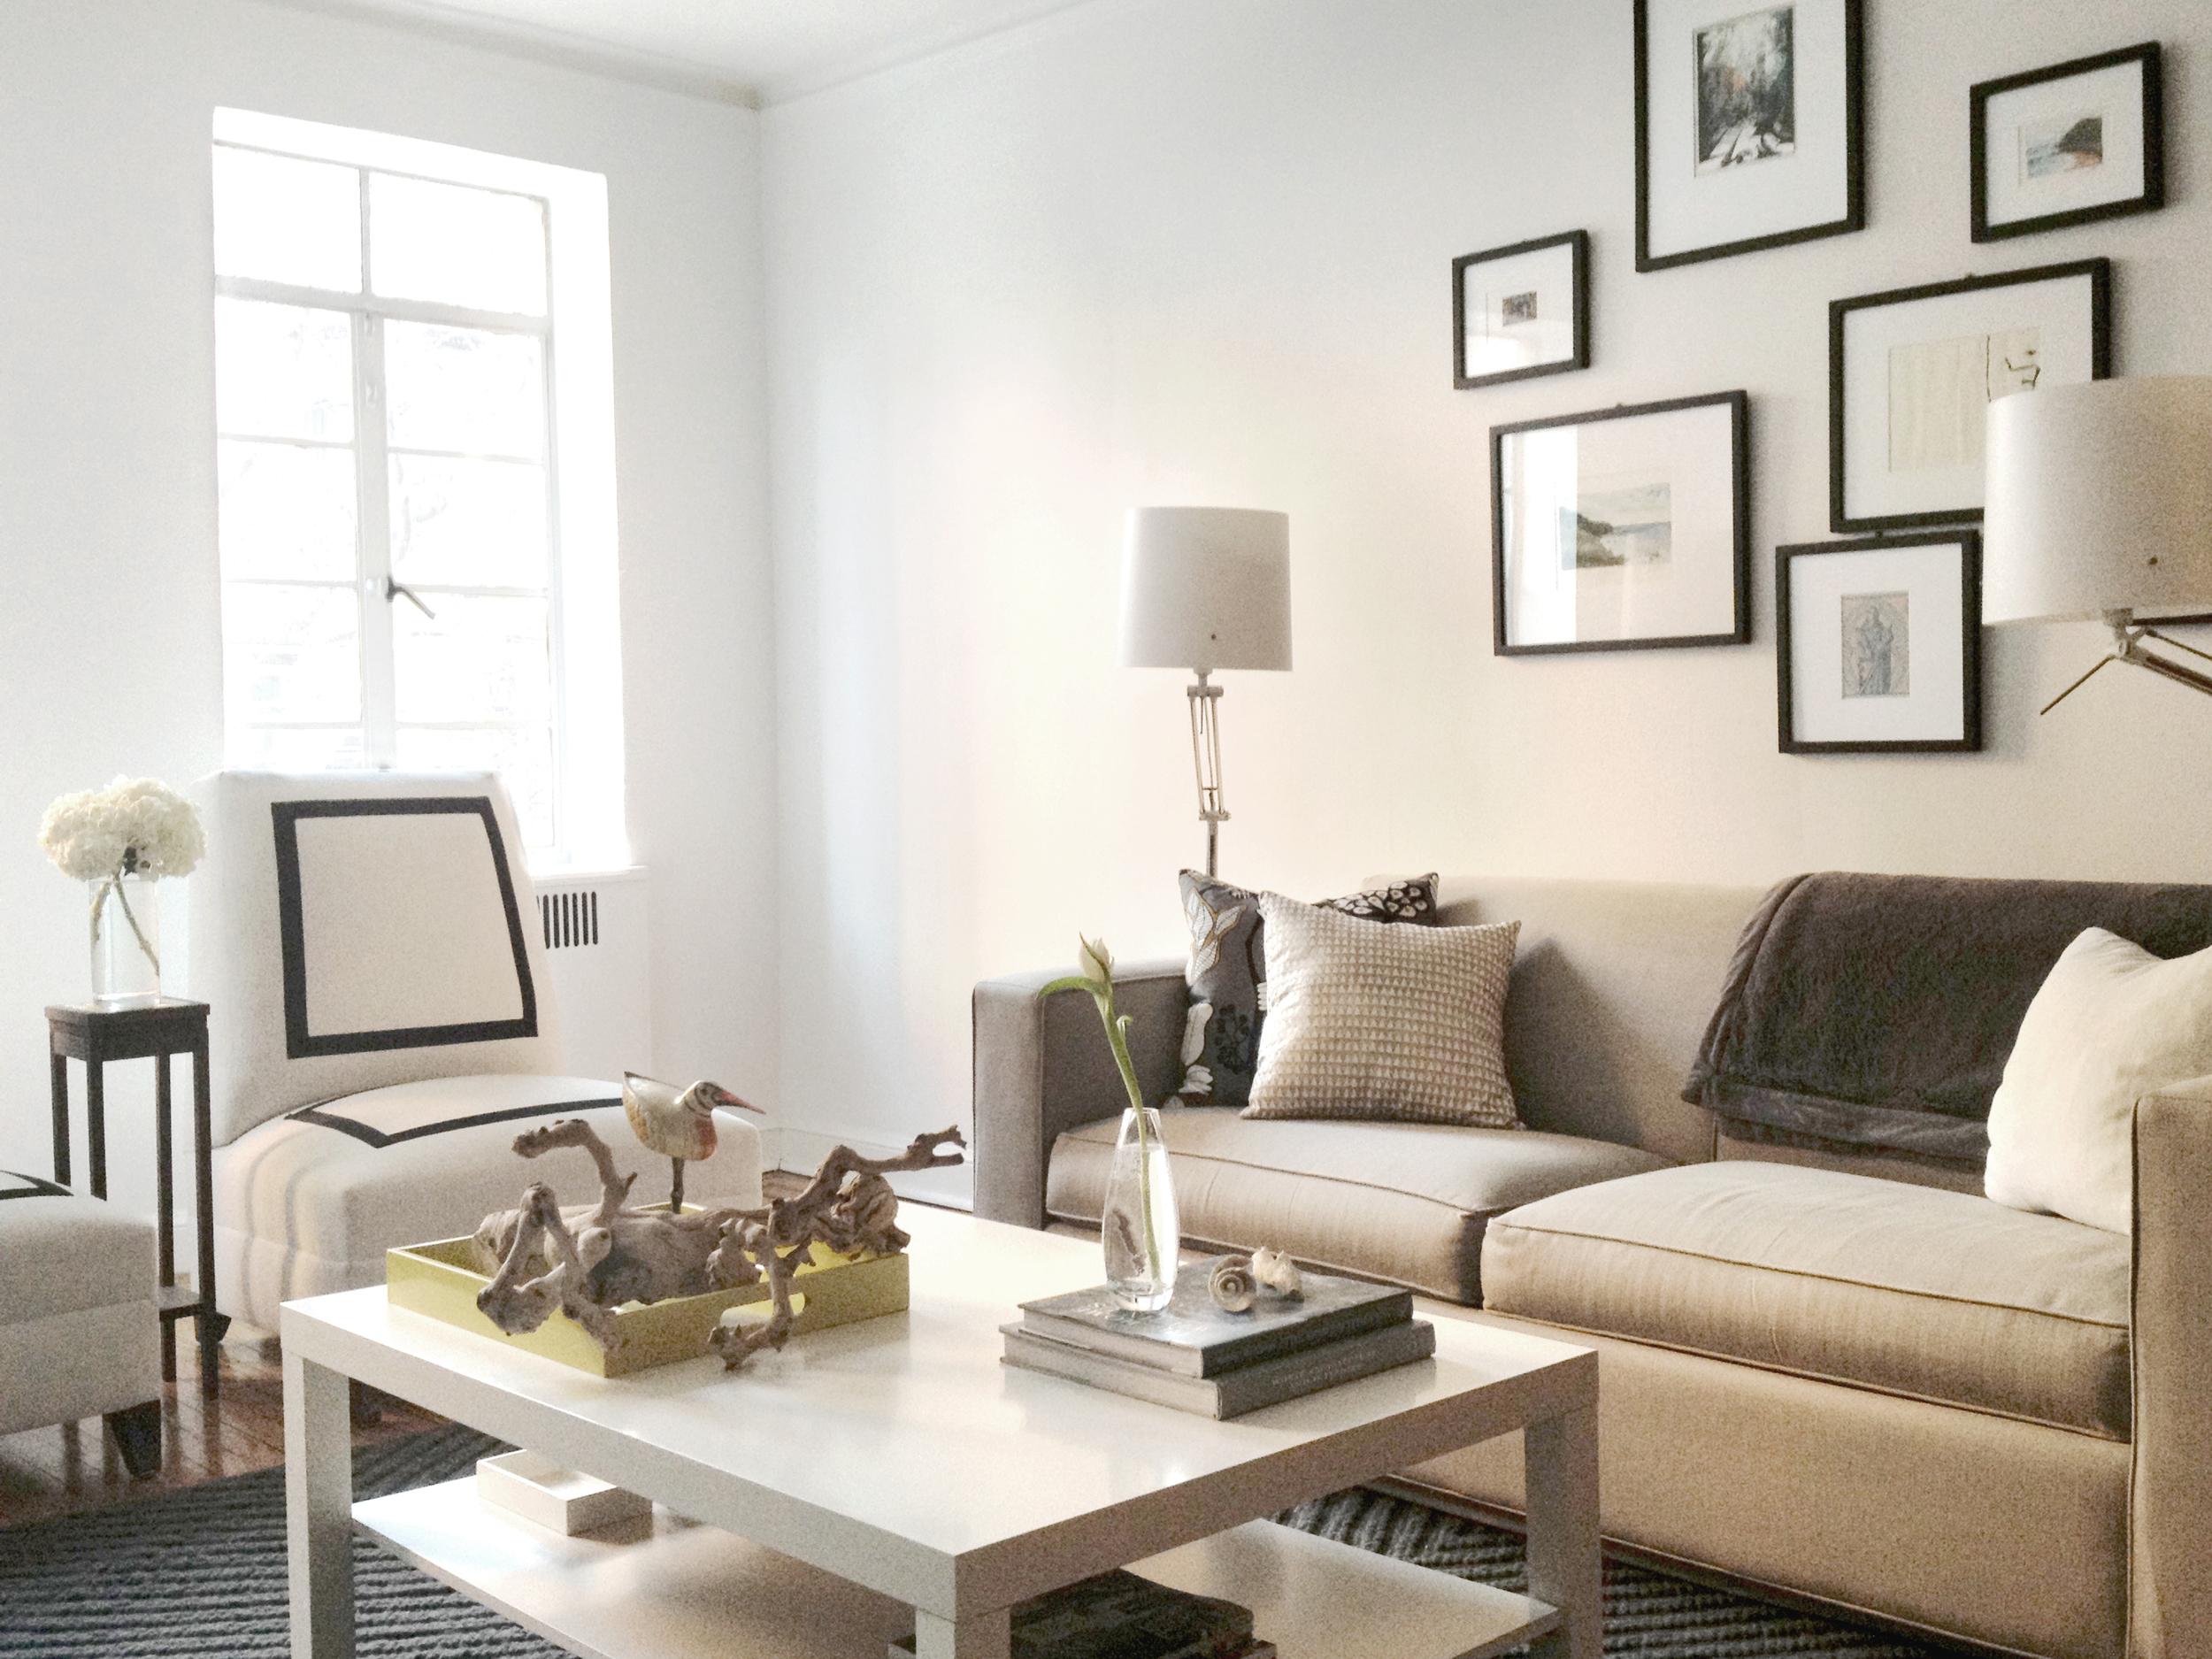 Jacqueline Pagan Interior Design|West 88 St|Living Room